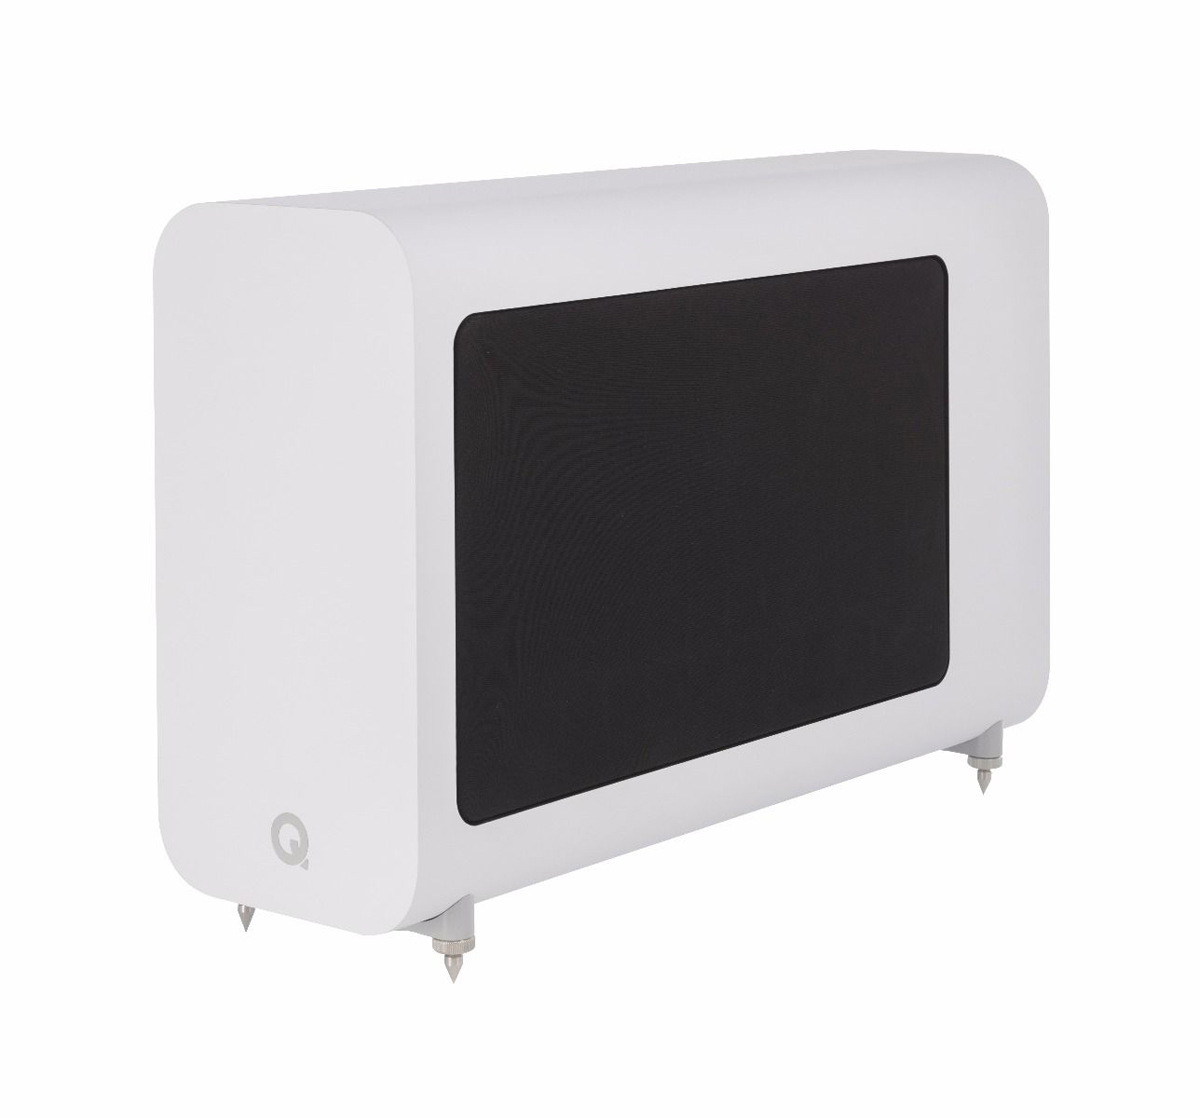 Q-Acoustics 3060S Aktive Subwoofer, white (checked return)